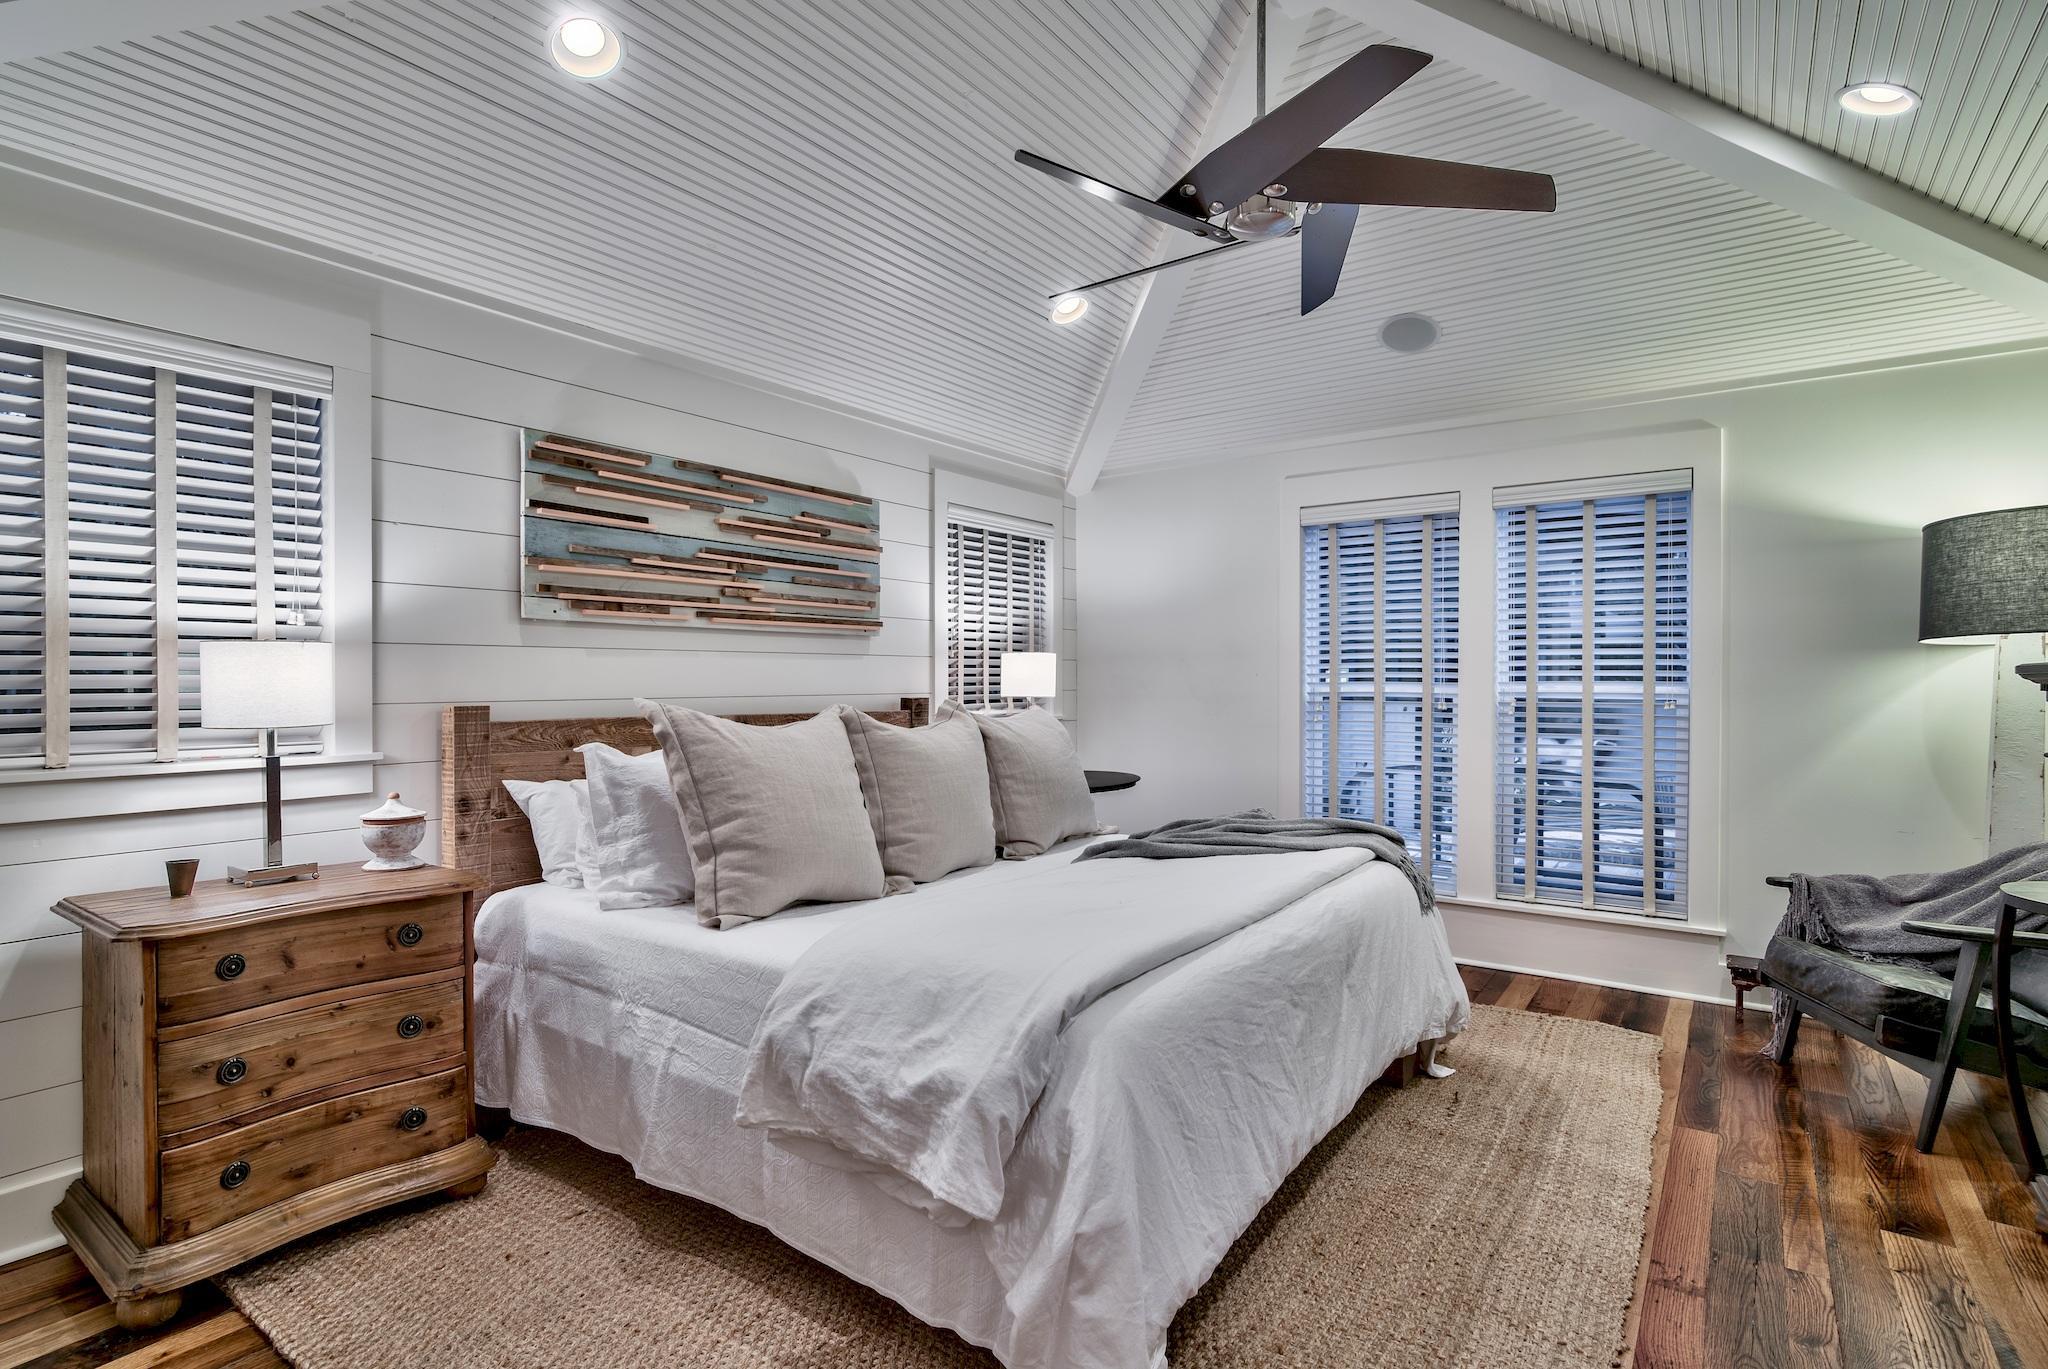 44 Camp Creek Road South,Inlet Beach,Florida 32461,3 Bedrooms Bedrooms,2 BathroomsBathrooms,Detached single family,Camp Creek Road South,20131126143817002353000000